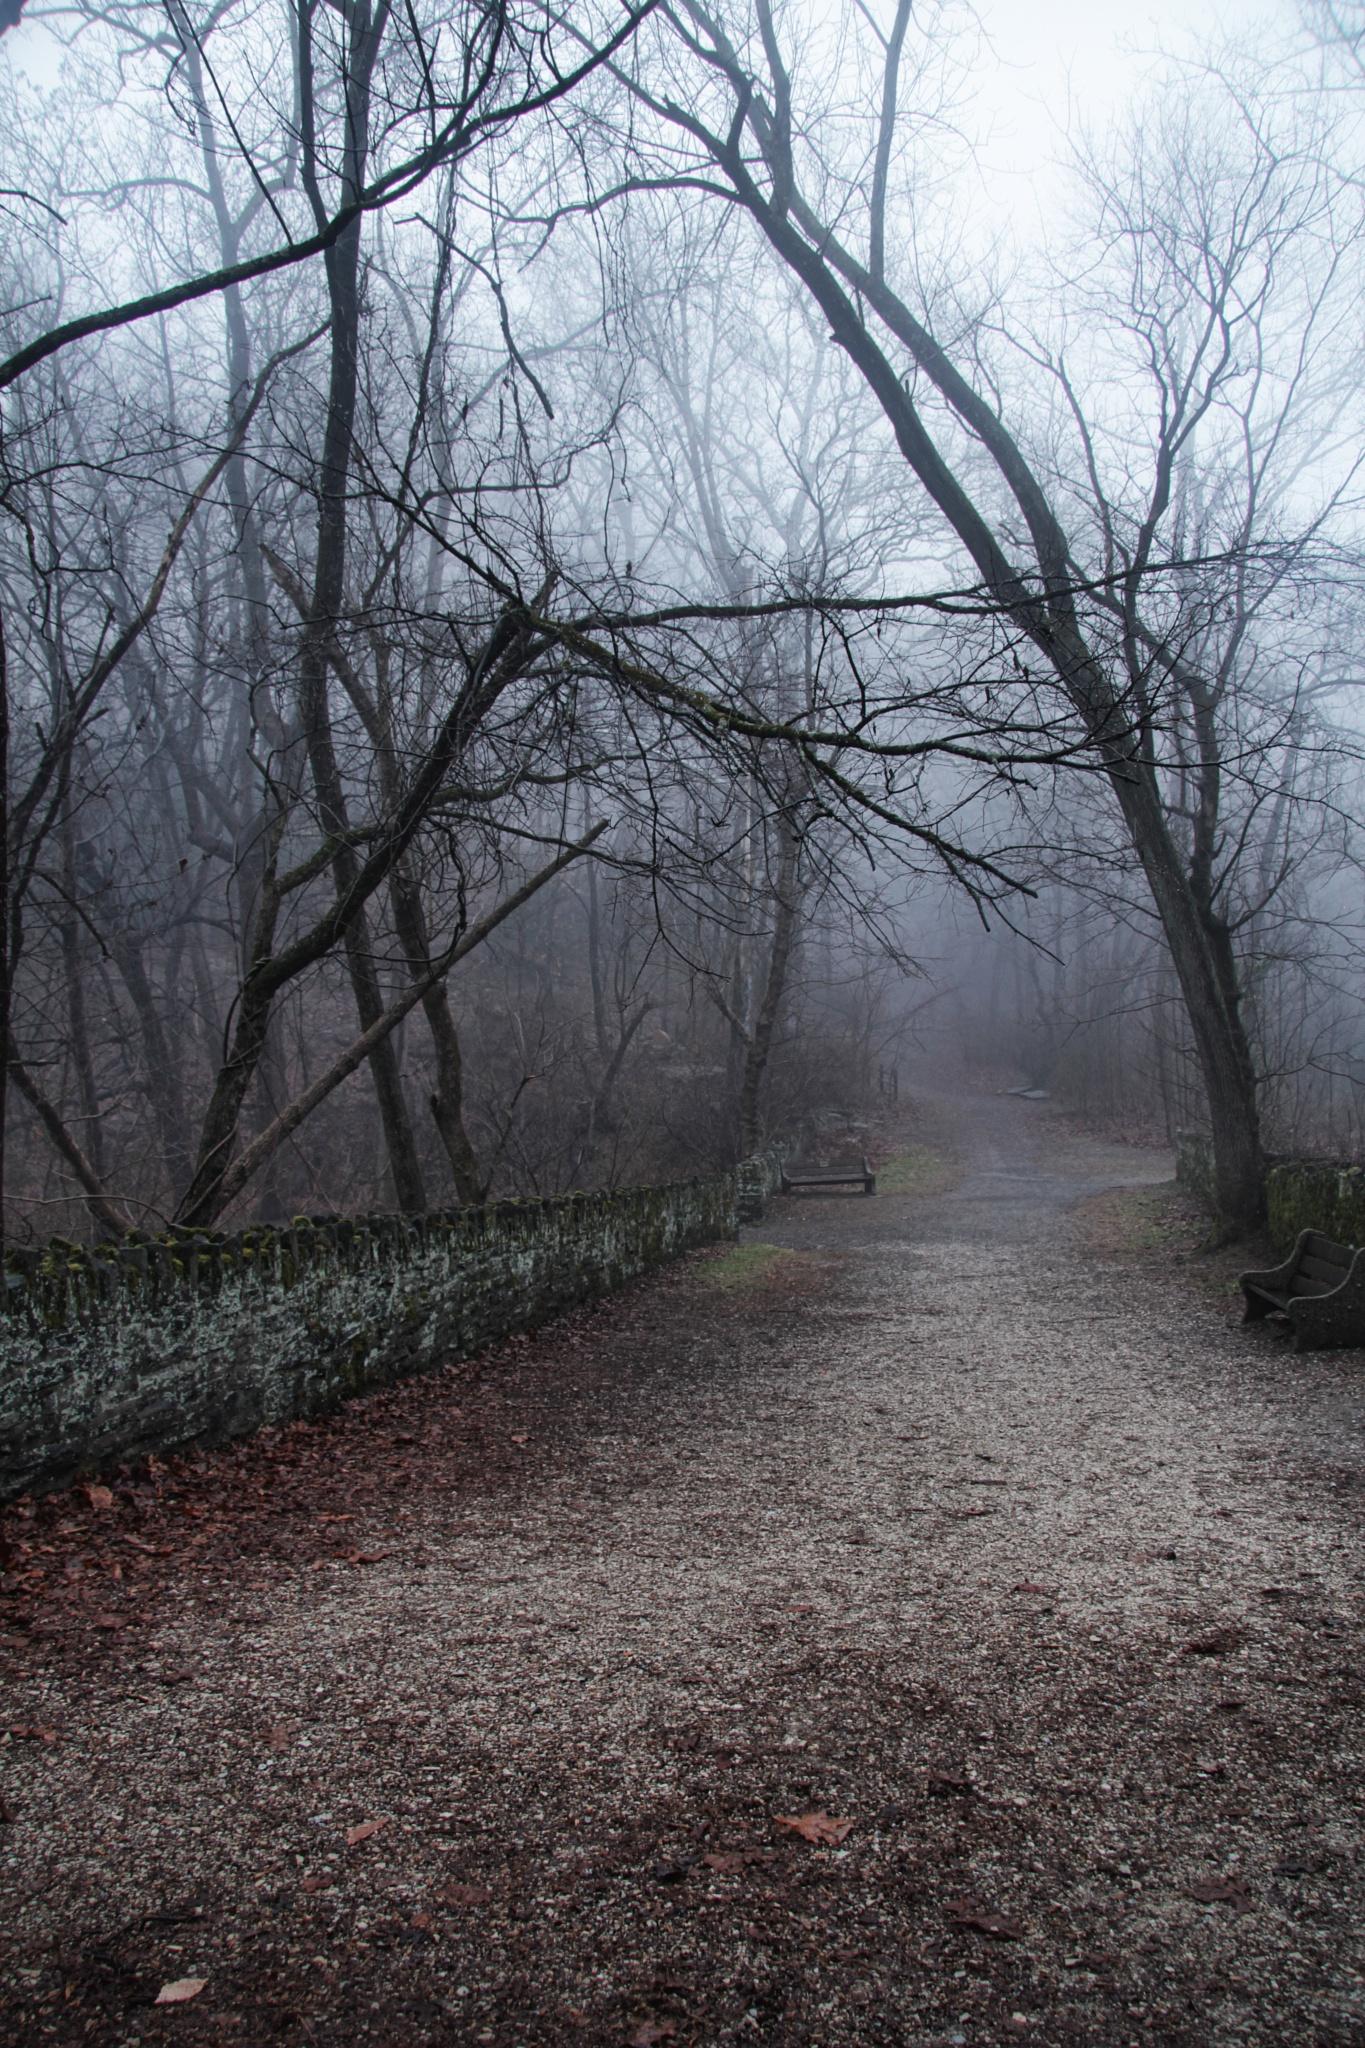 Wissahickon Fog by Ultravphotography